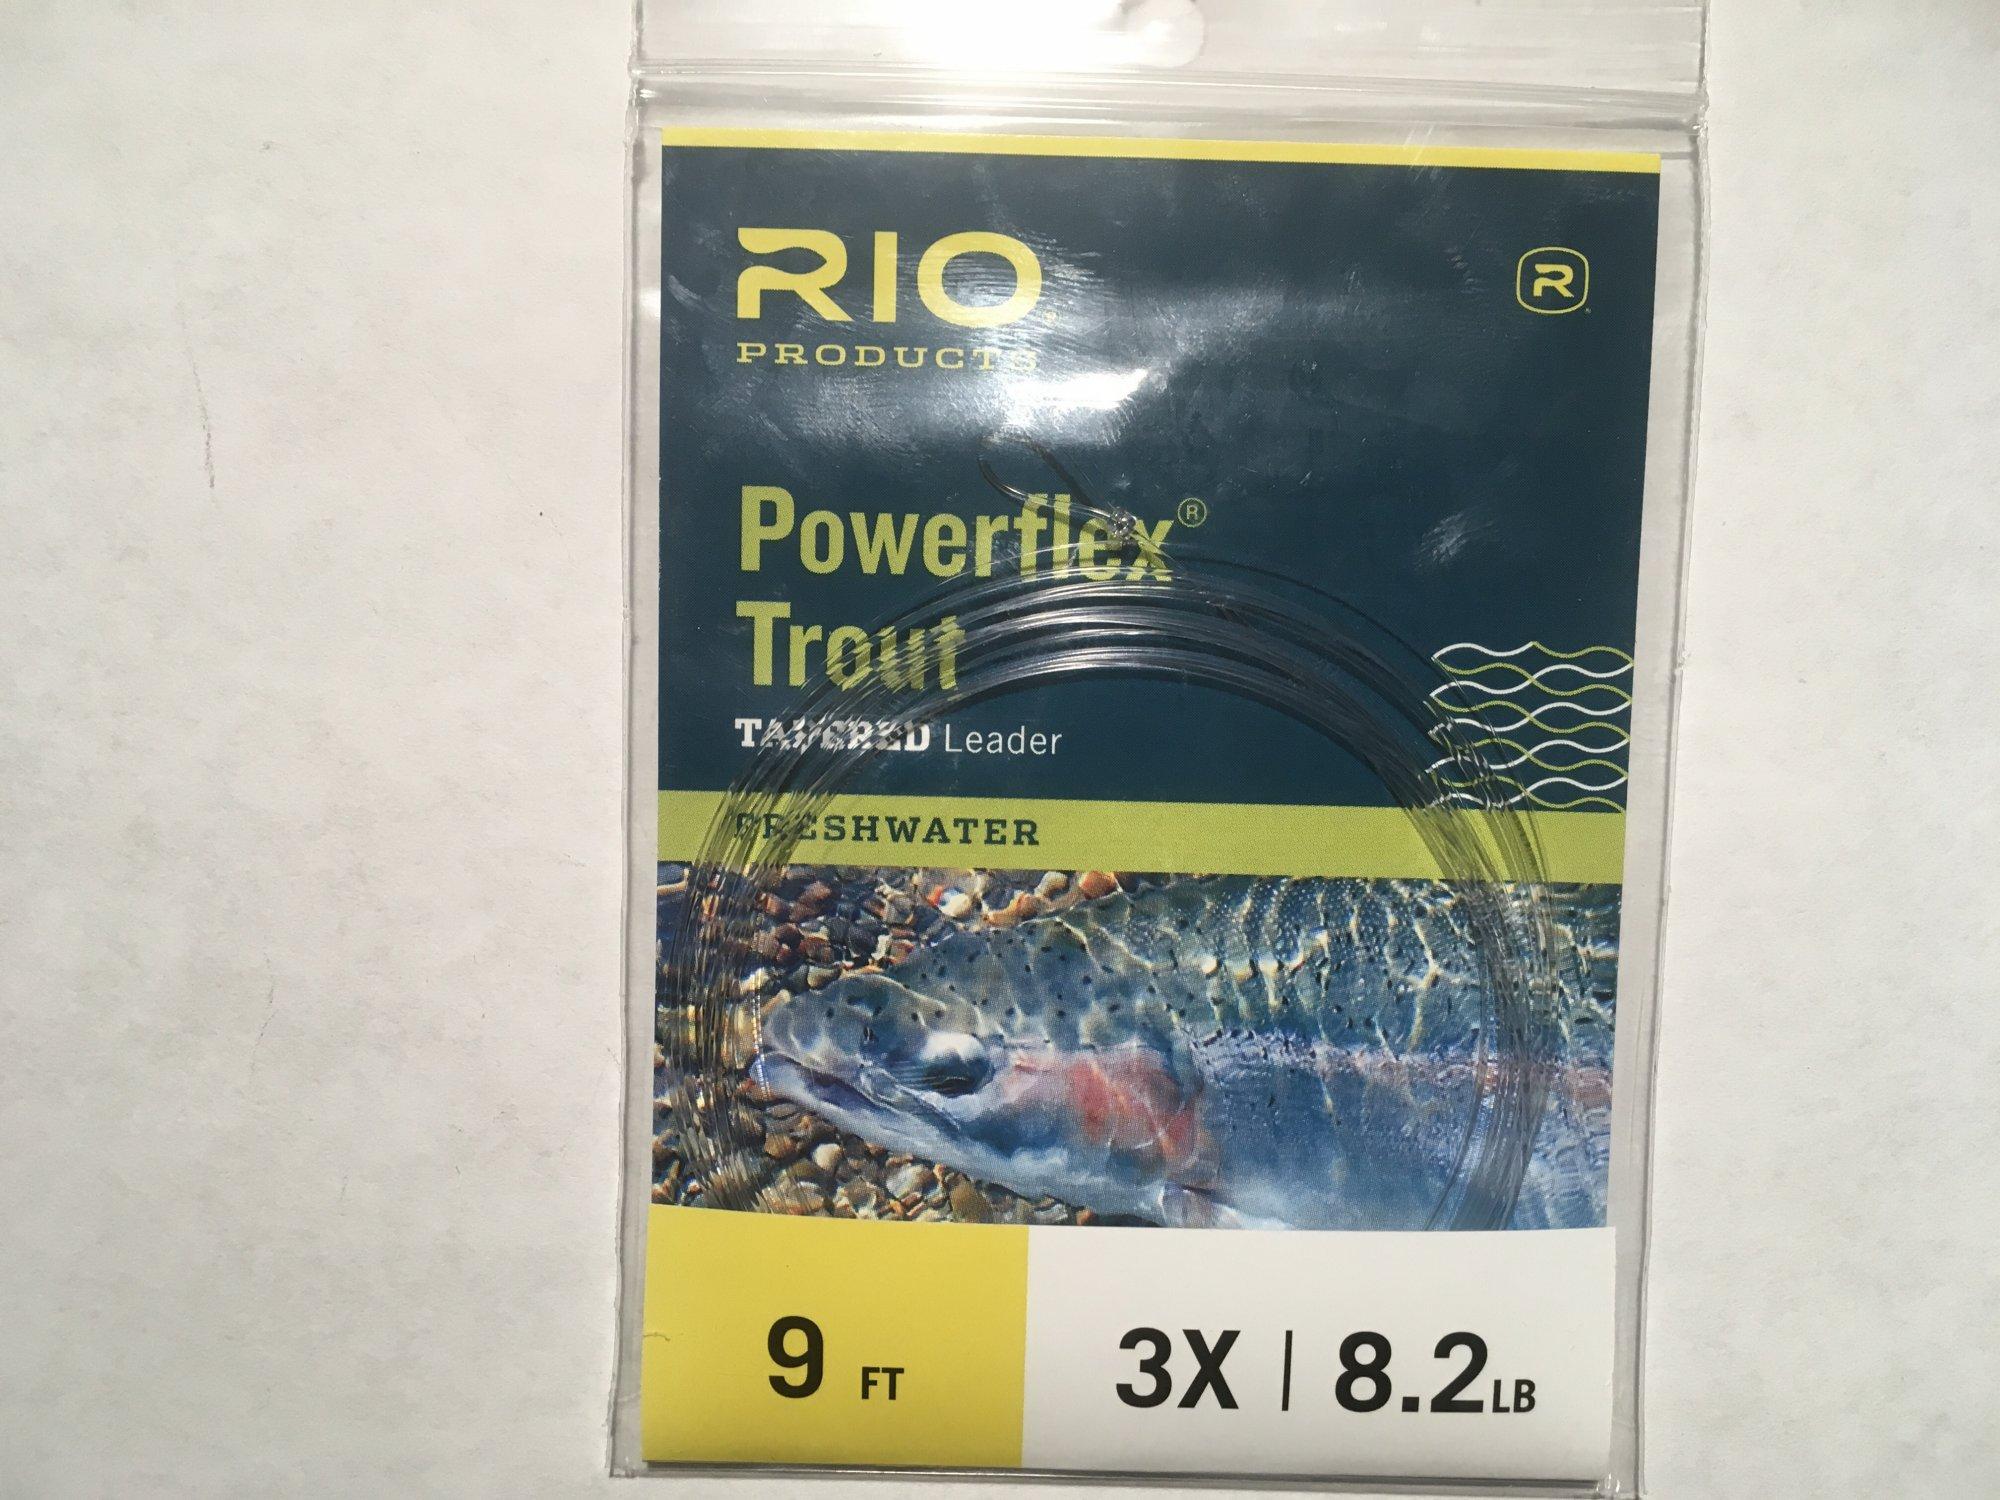 Powerflex | 9ft 3x leader